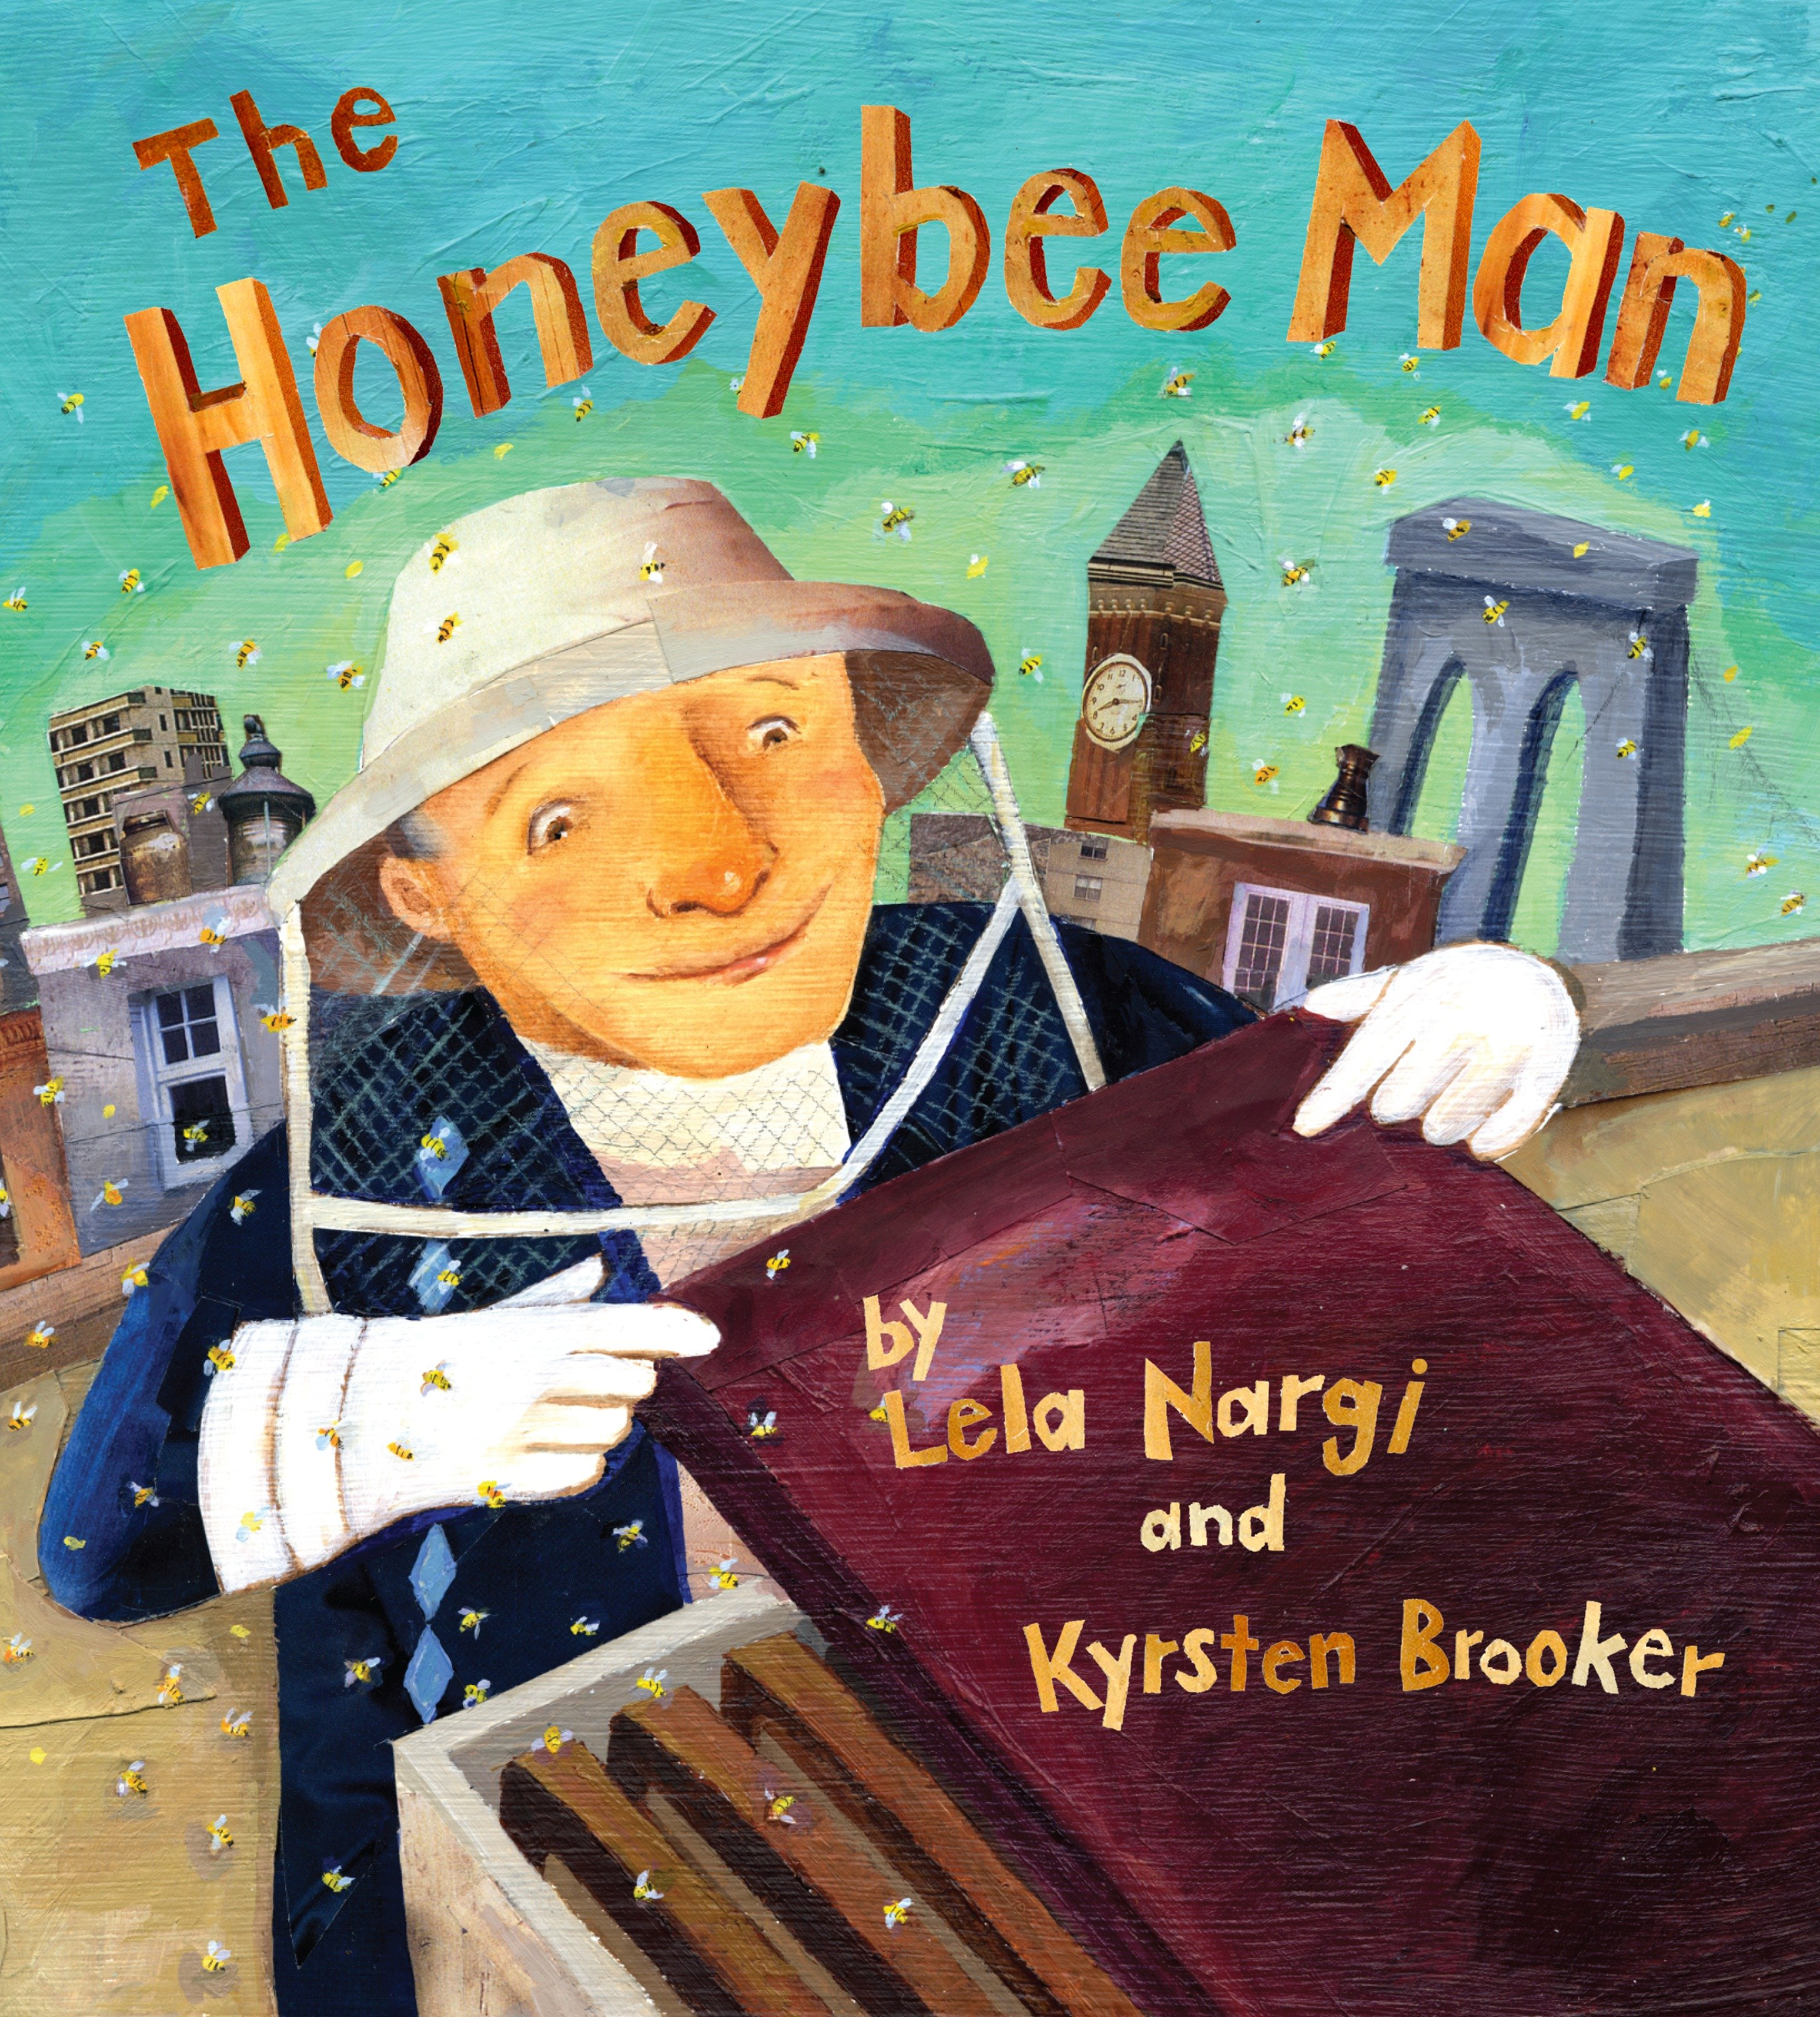 The honeybee man cover image